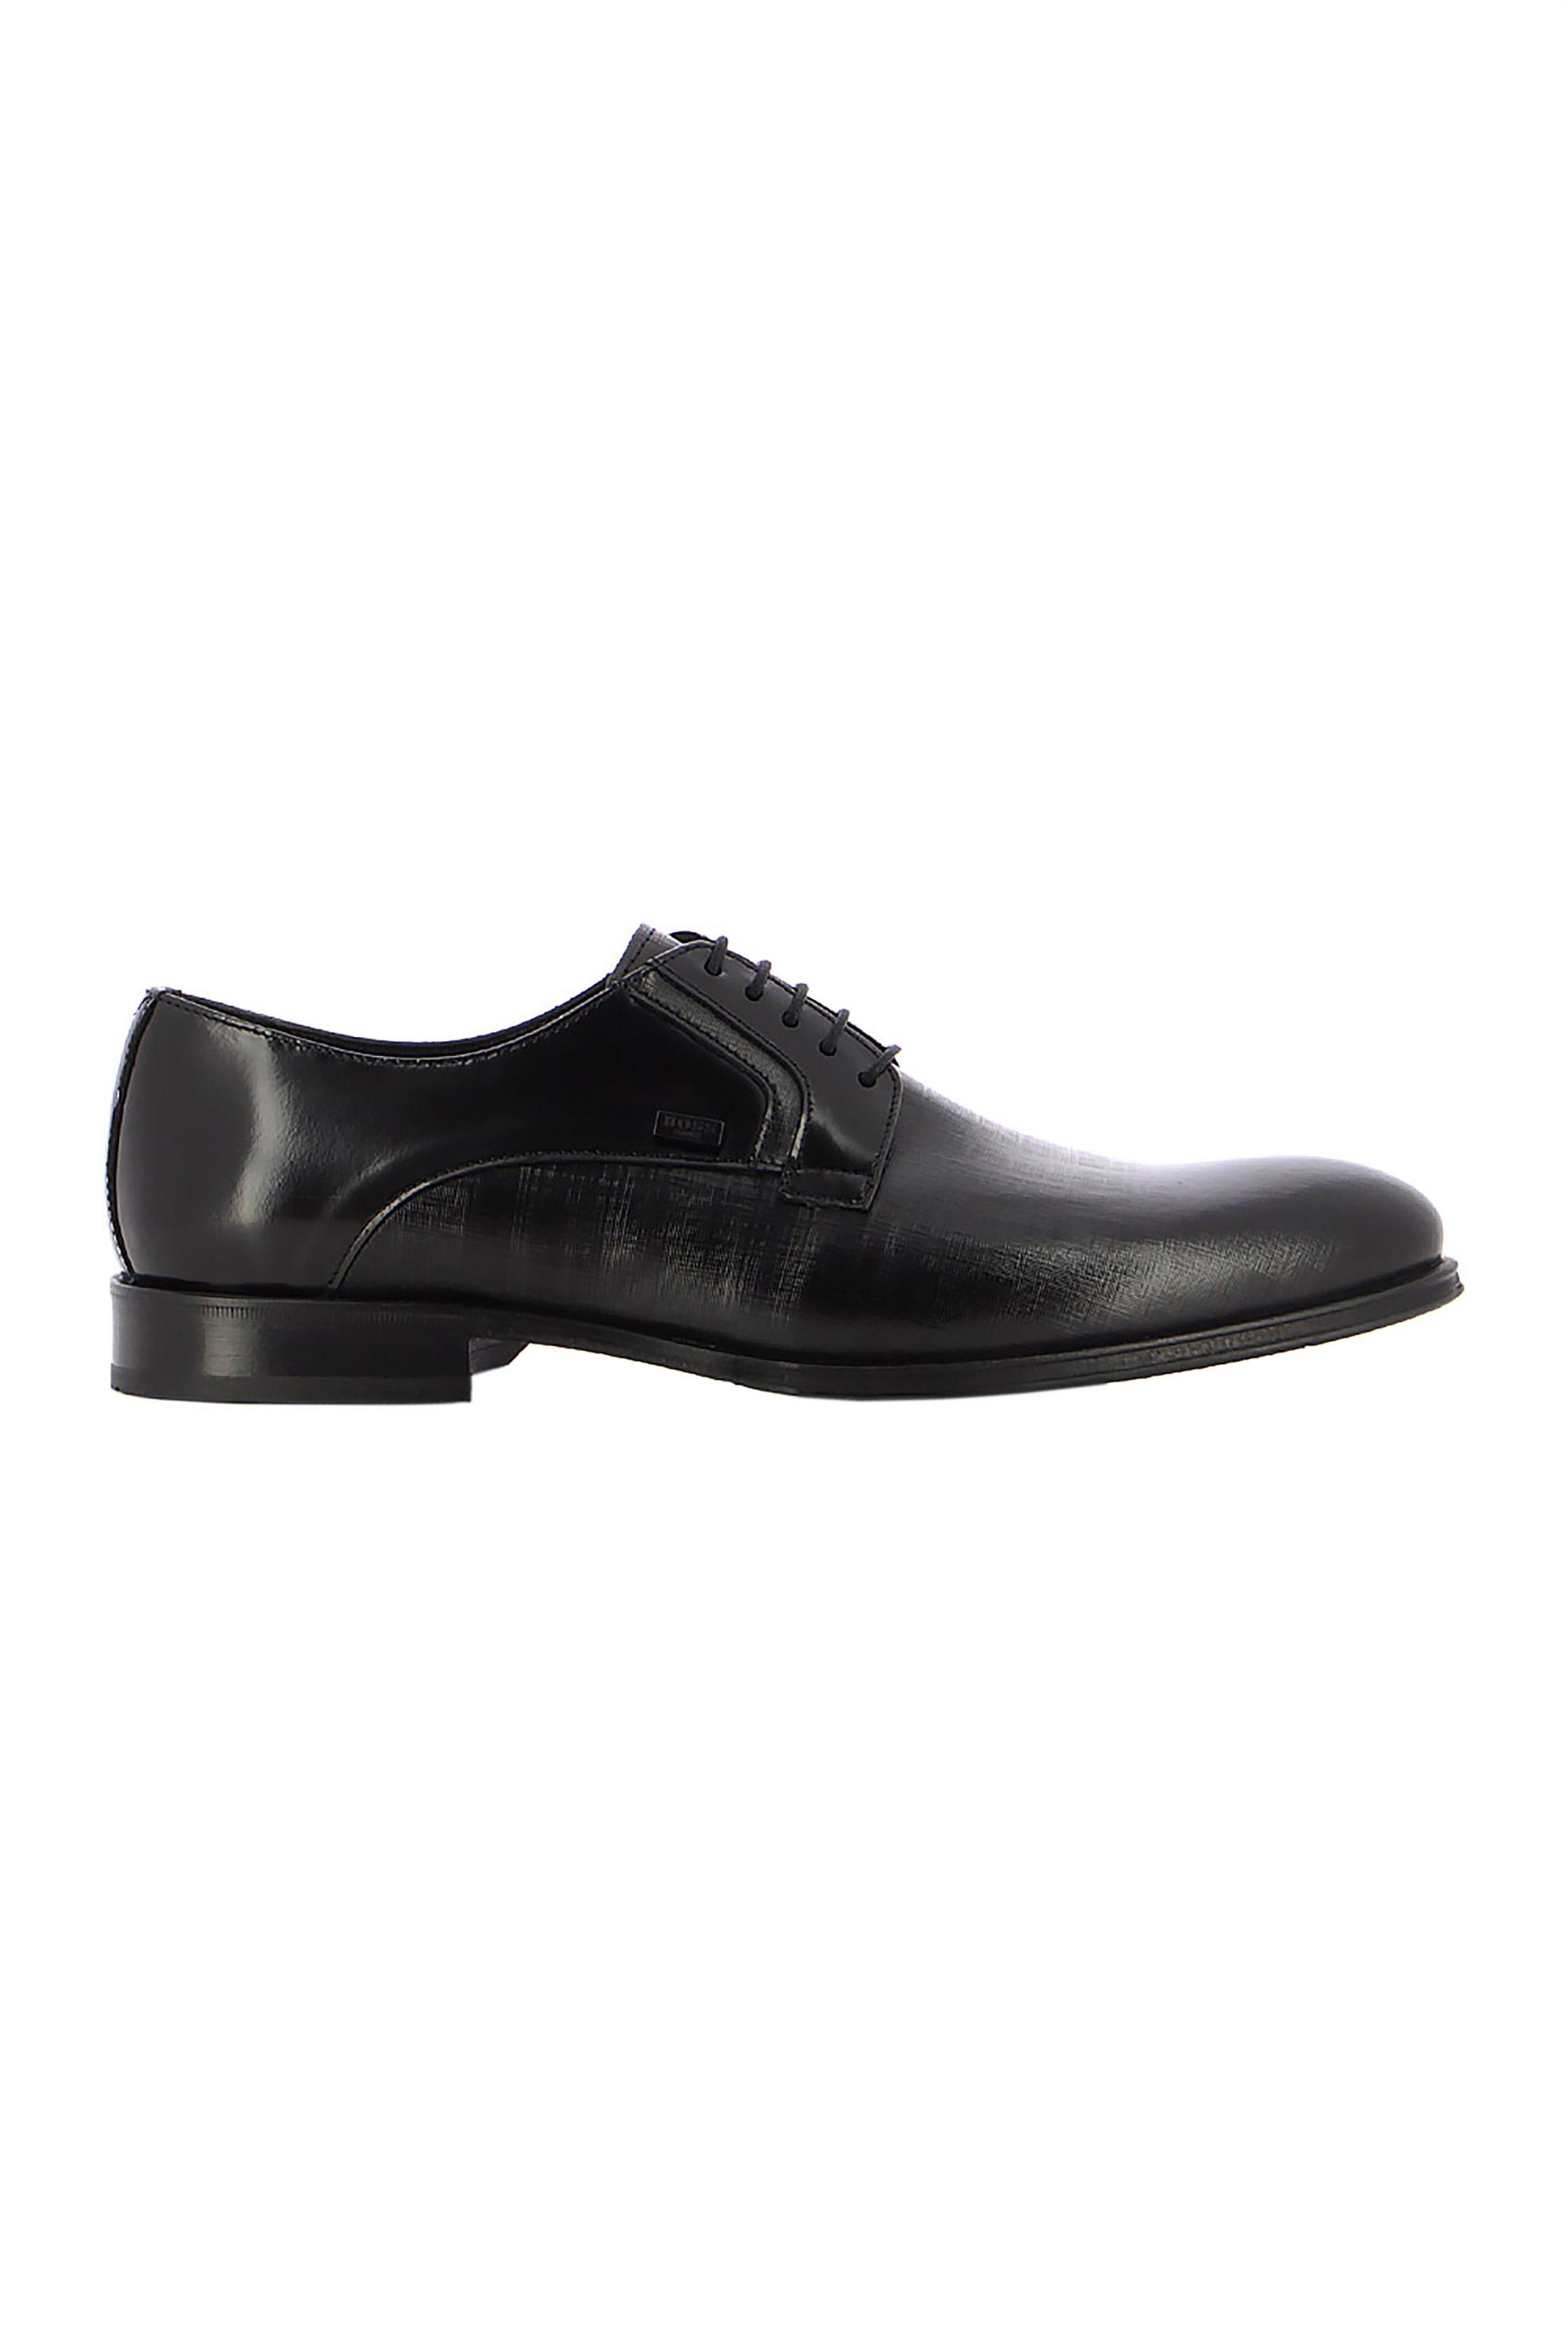 Boss Shoes ανδρικά δερμάτινα σκαρπίνια με κορδόνια – N6310 GLM – Μαύρο